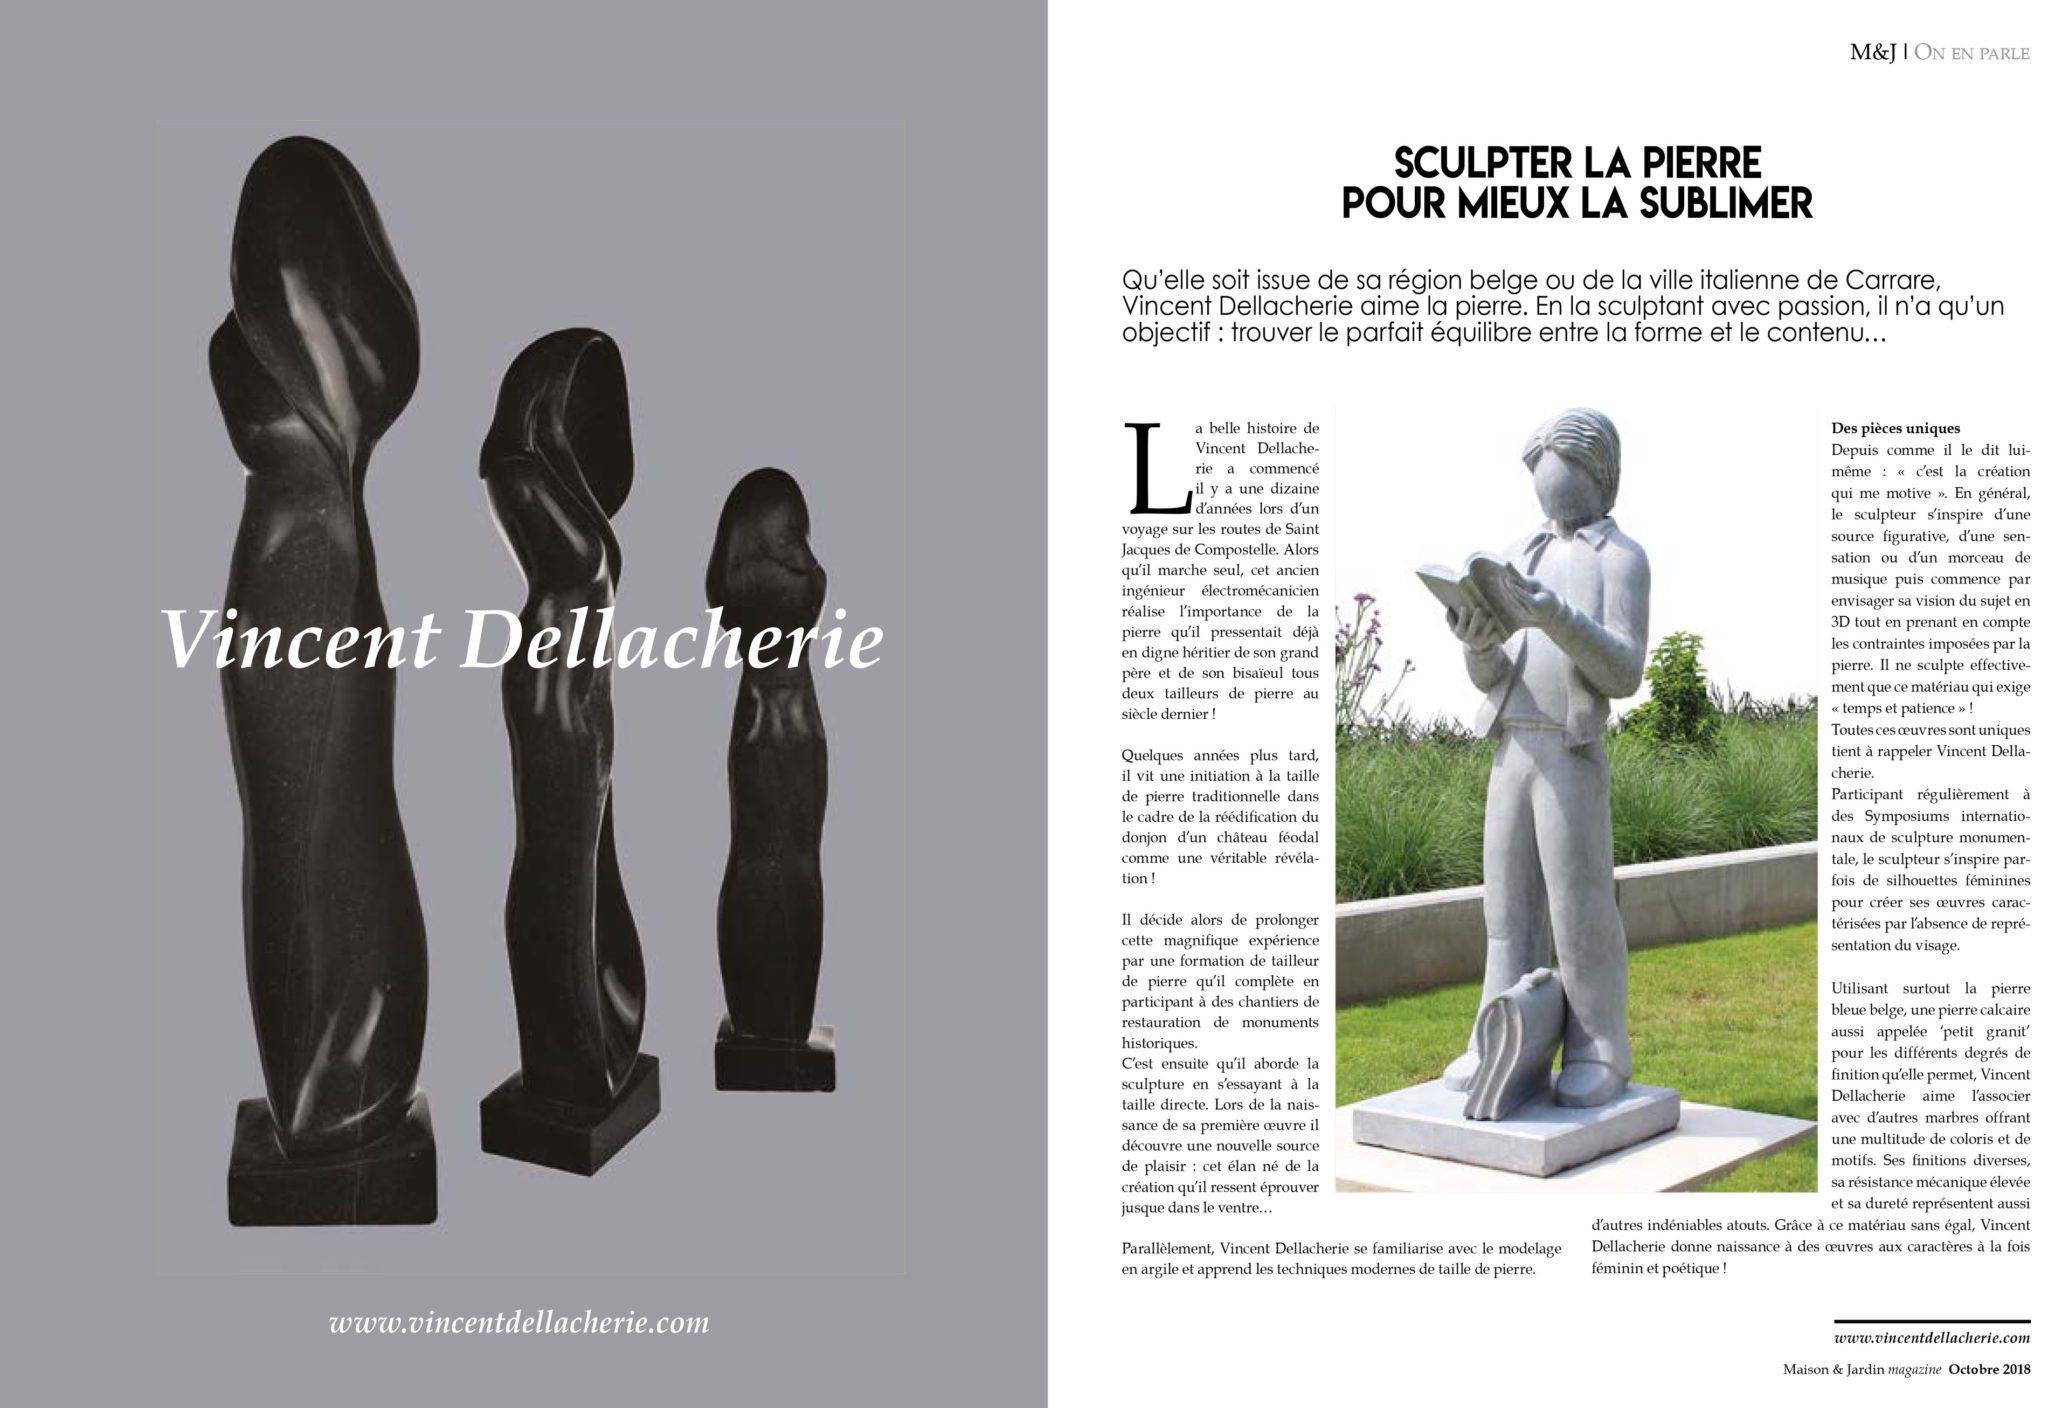 C Maison Et Jardin Magazine maison & jardin magazine - sweeft studio